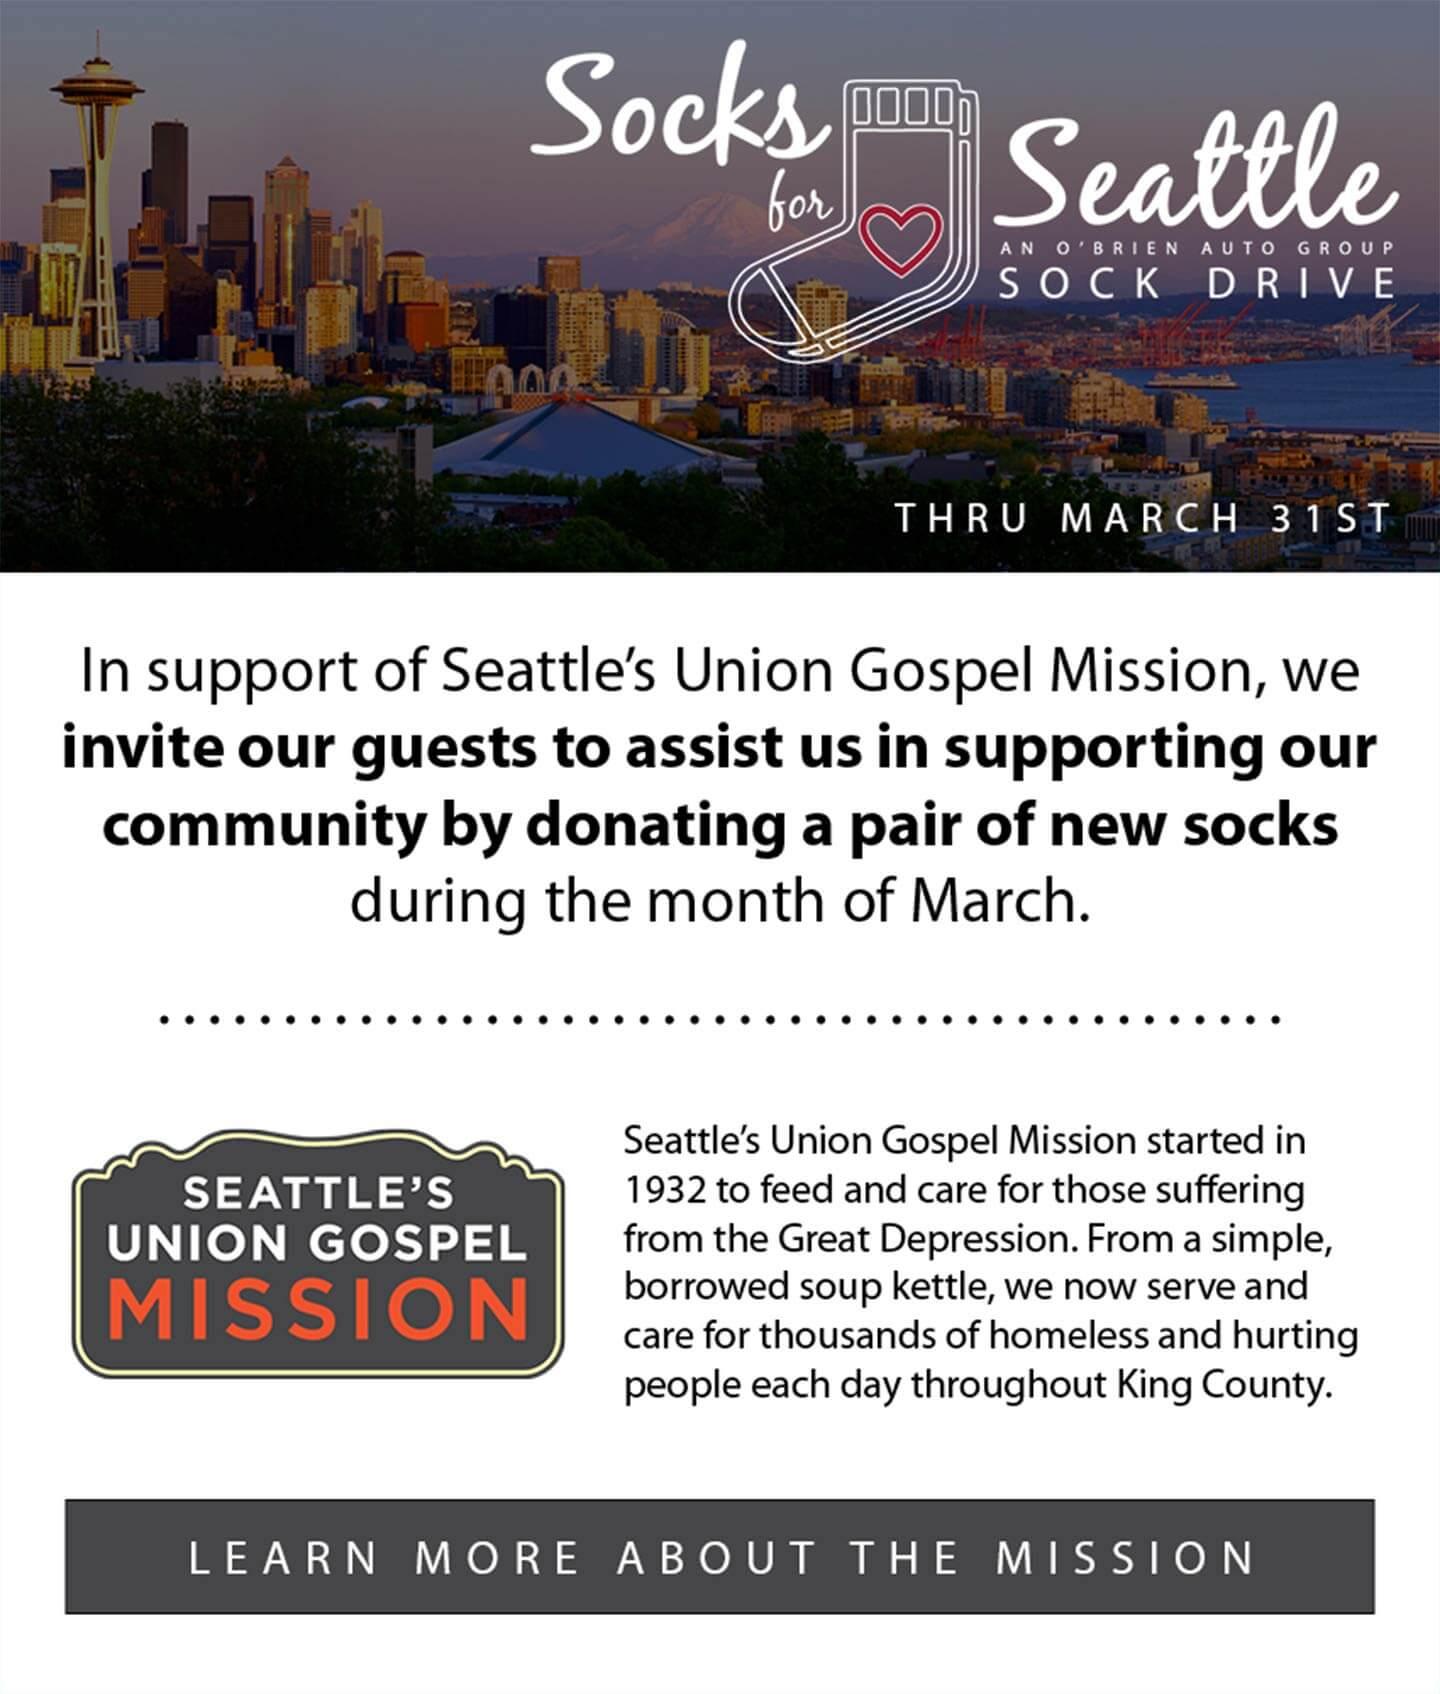 Socks for Seattle Sock Drive